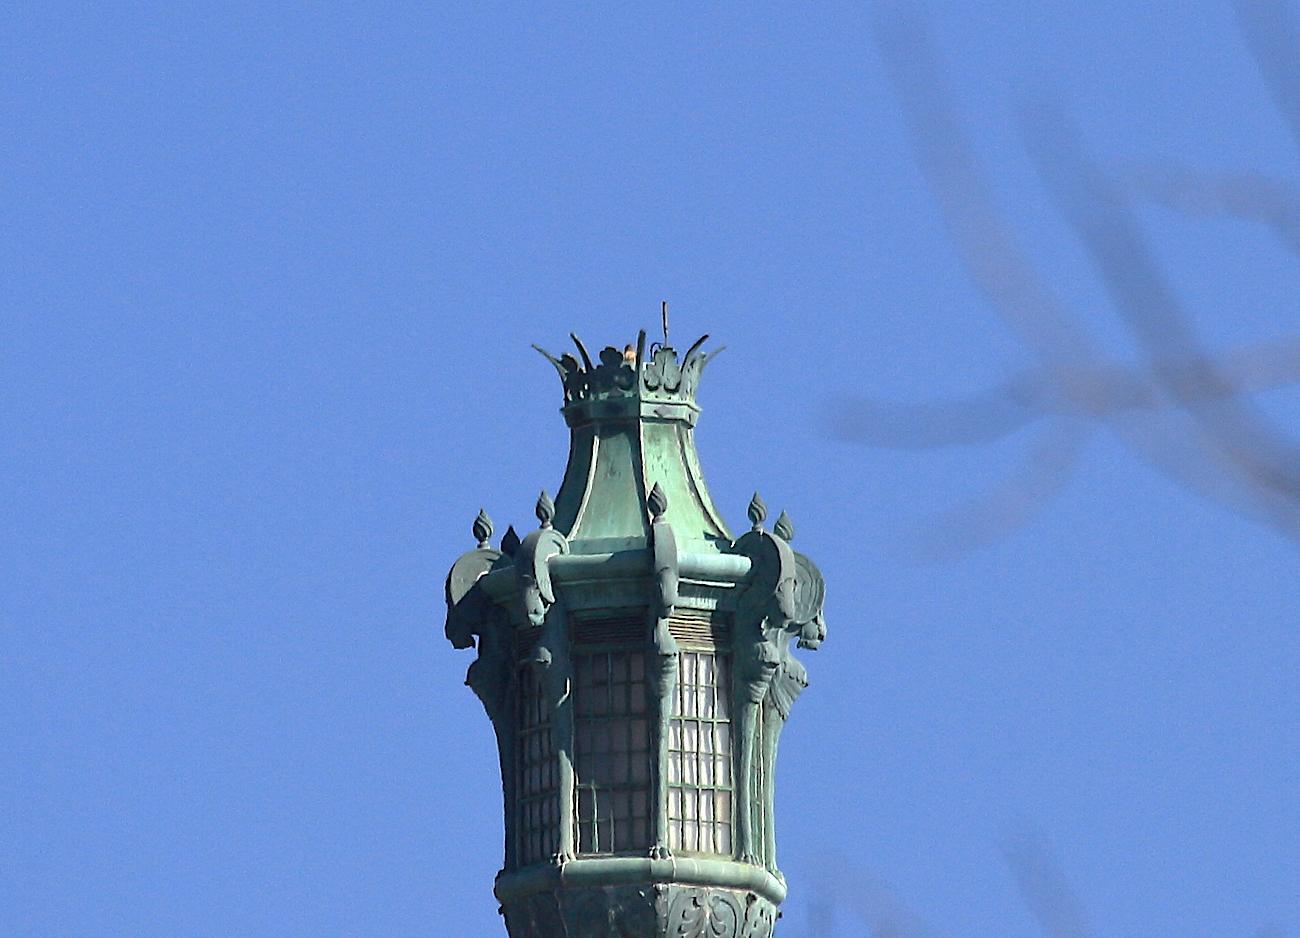 Washington Square Park Hawks and acrobatic Raven – January